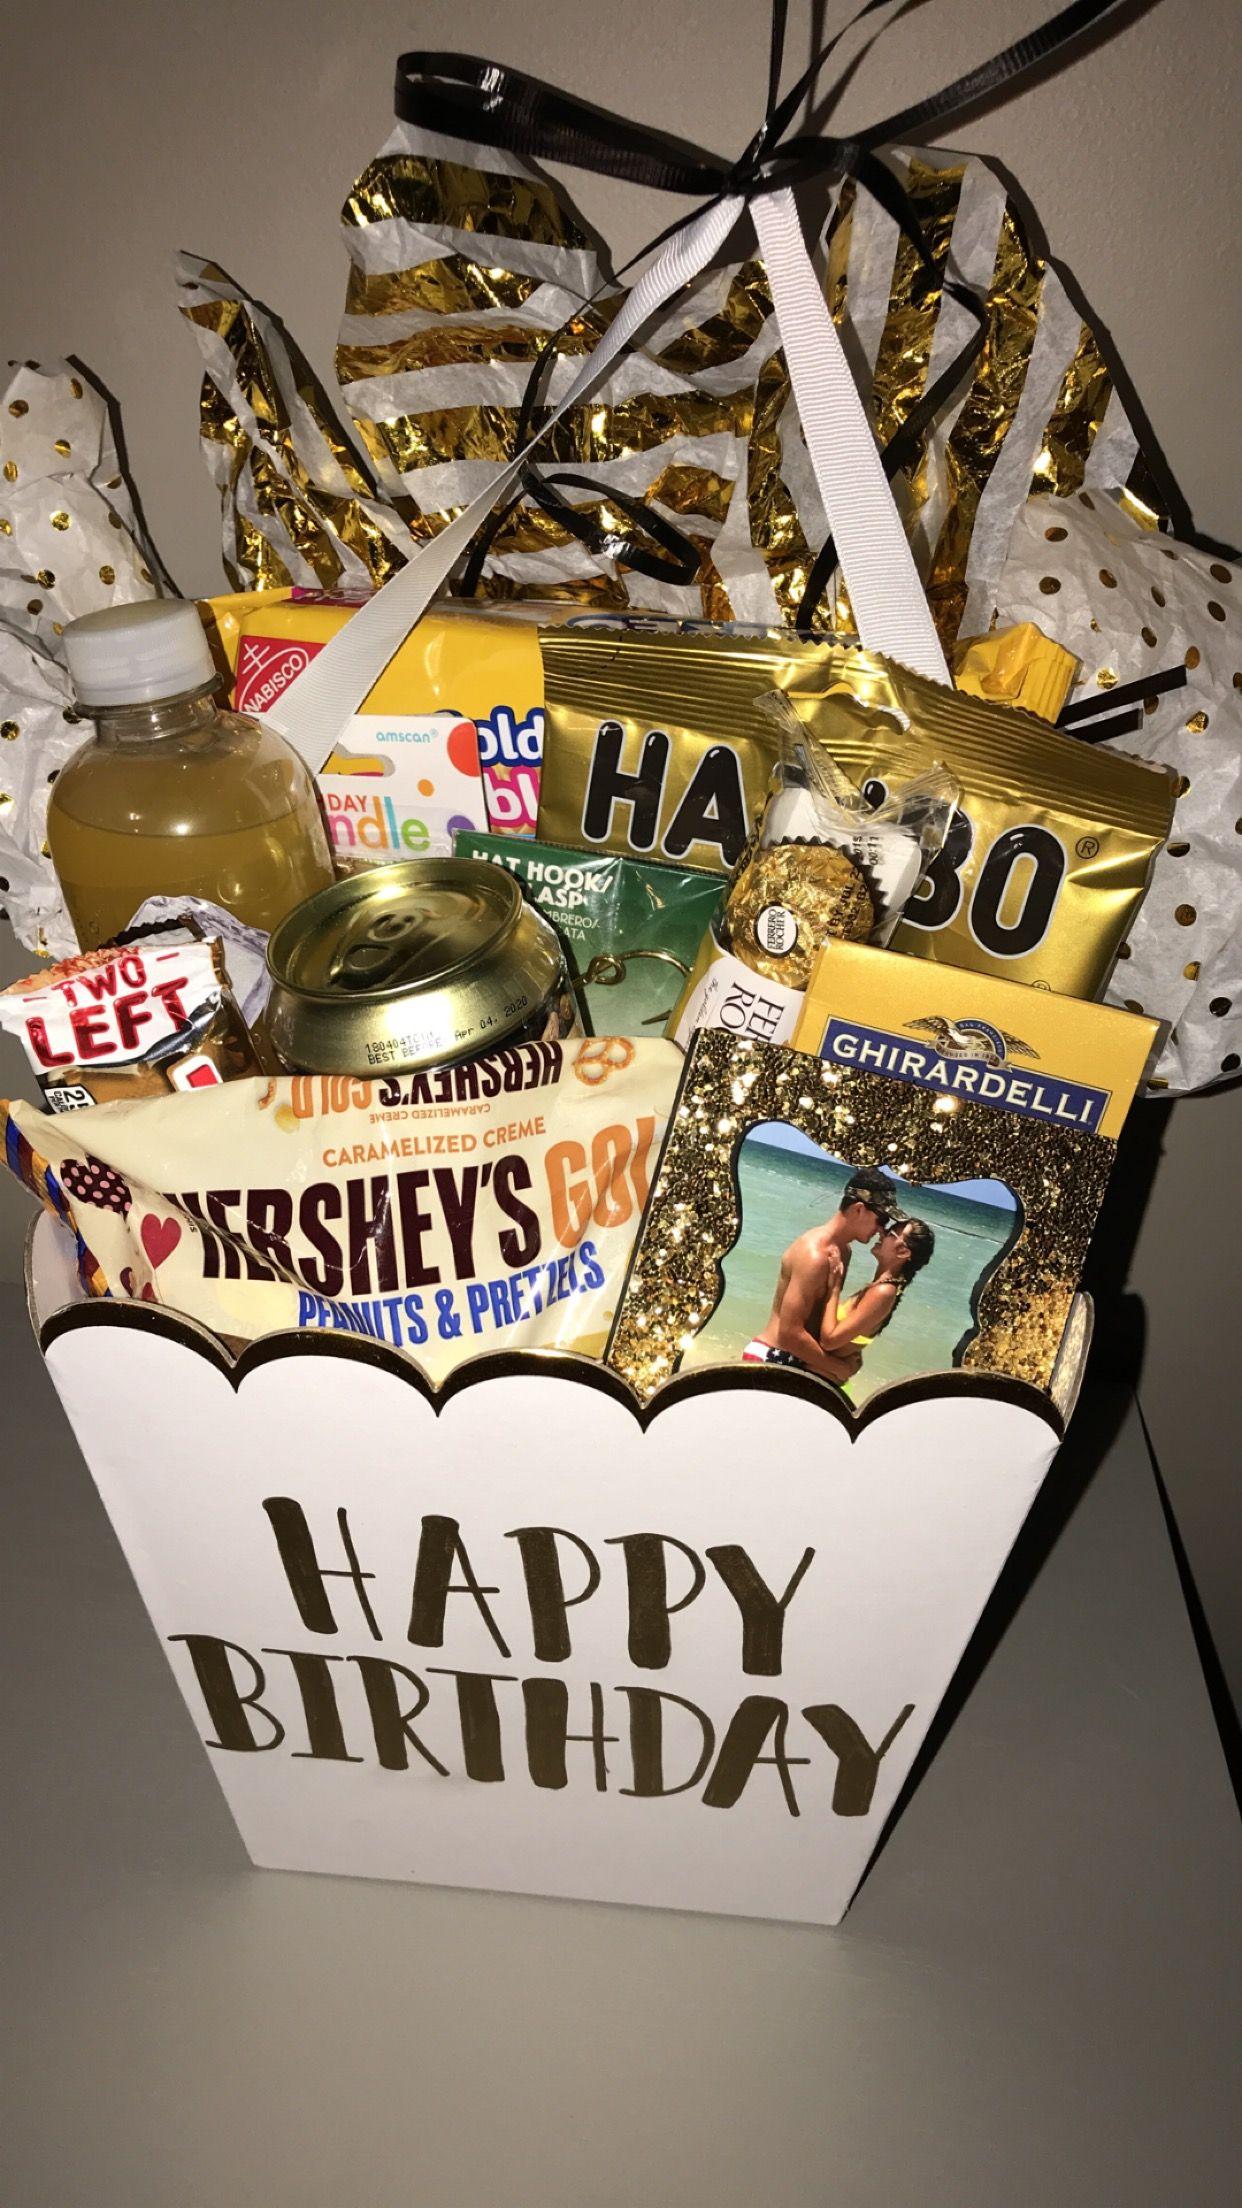 Golden Birthday gift idea! Golden birthday parties